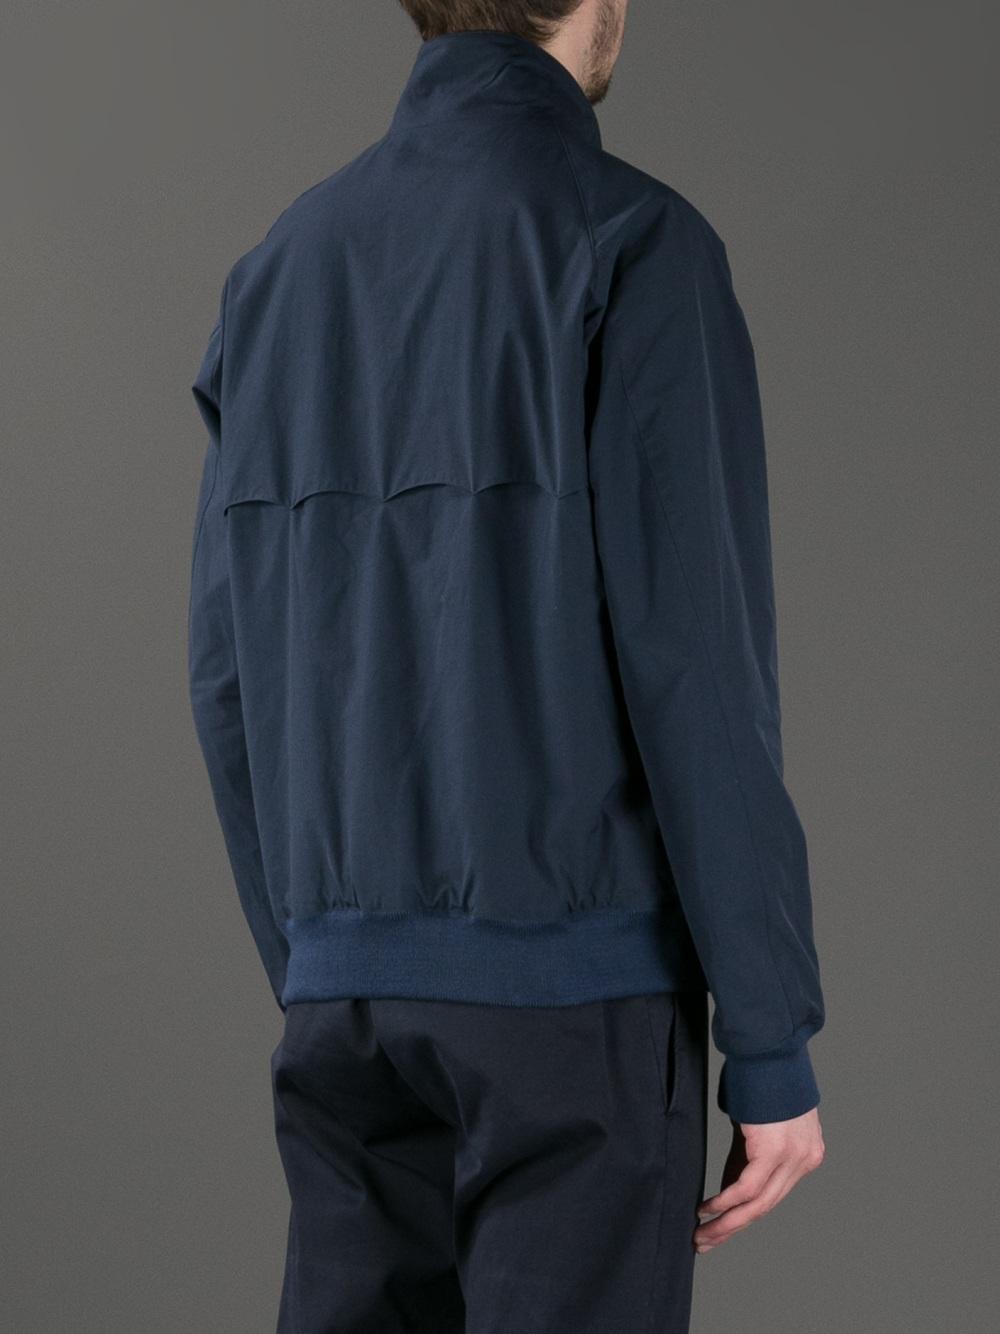 Baracuta Harrington Coolmax Lined Jacket in Navy (Blue) for Men